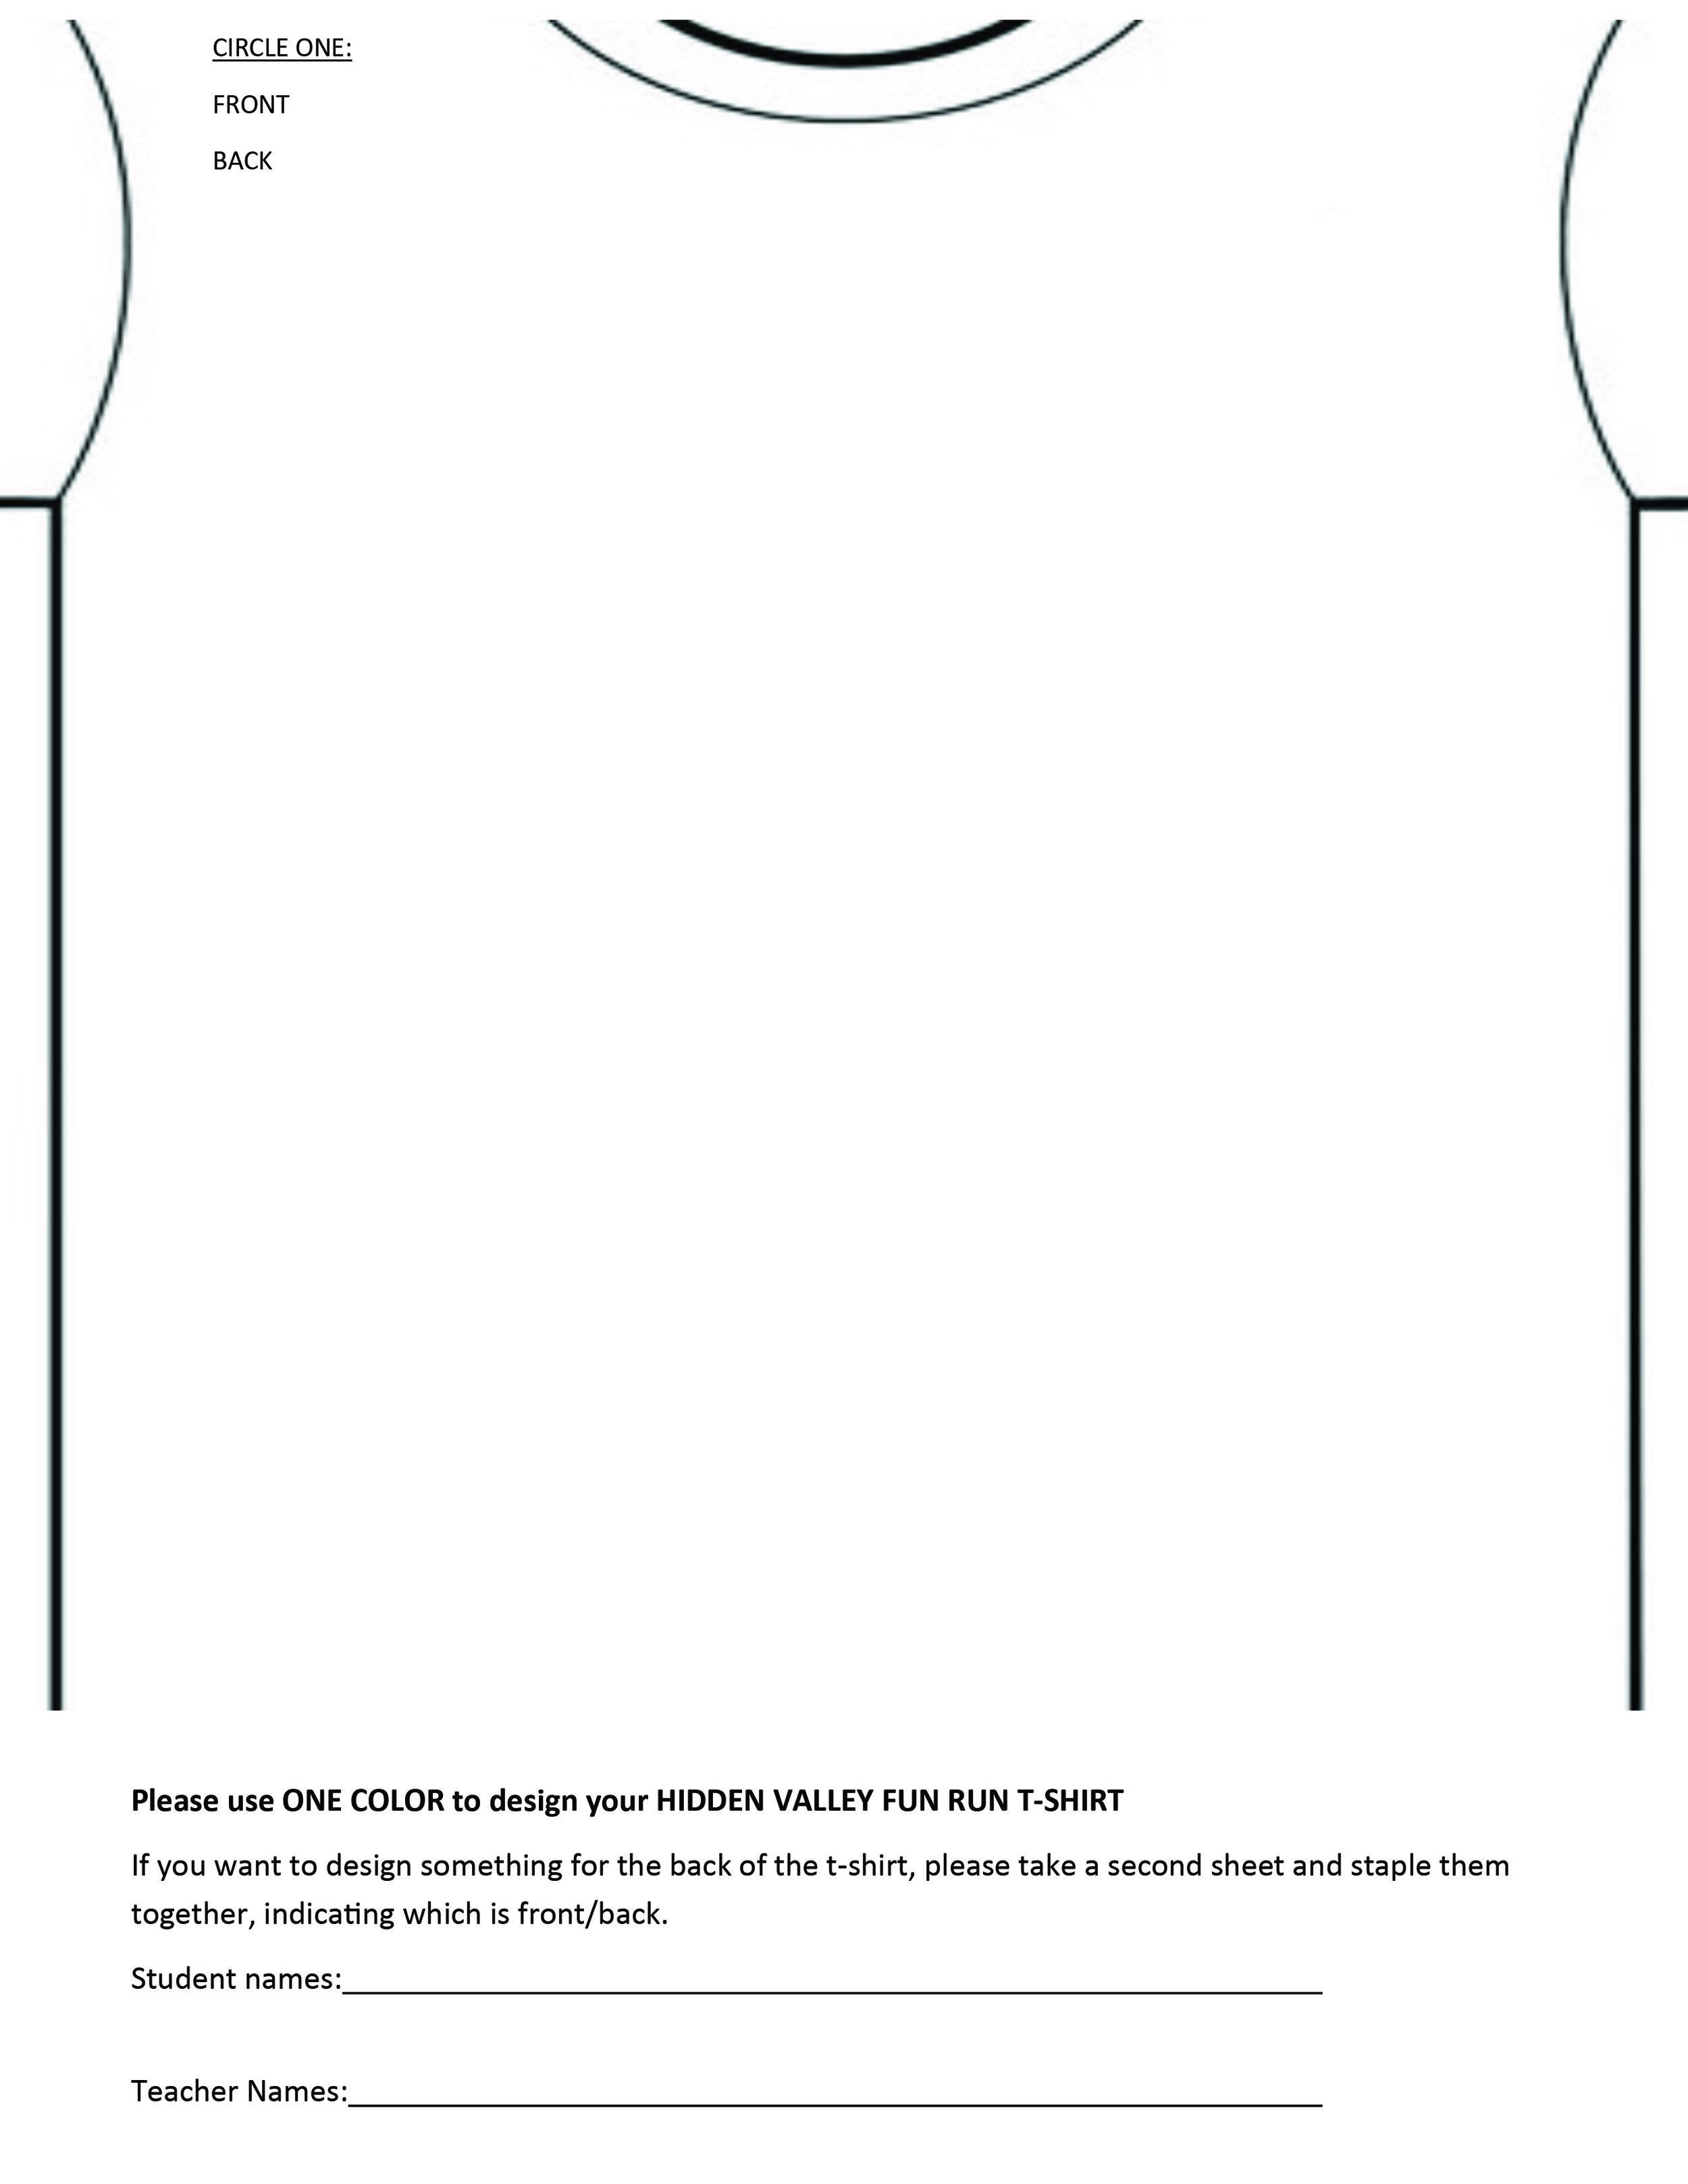 tshirt contest template .jpg